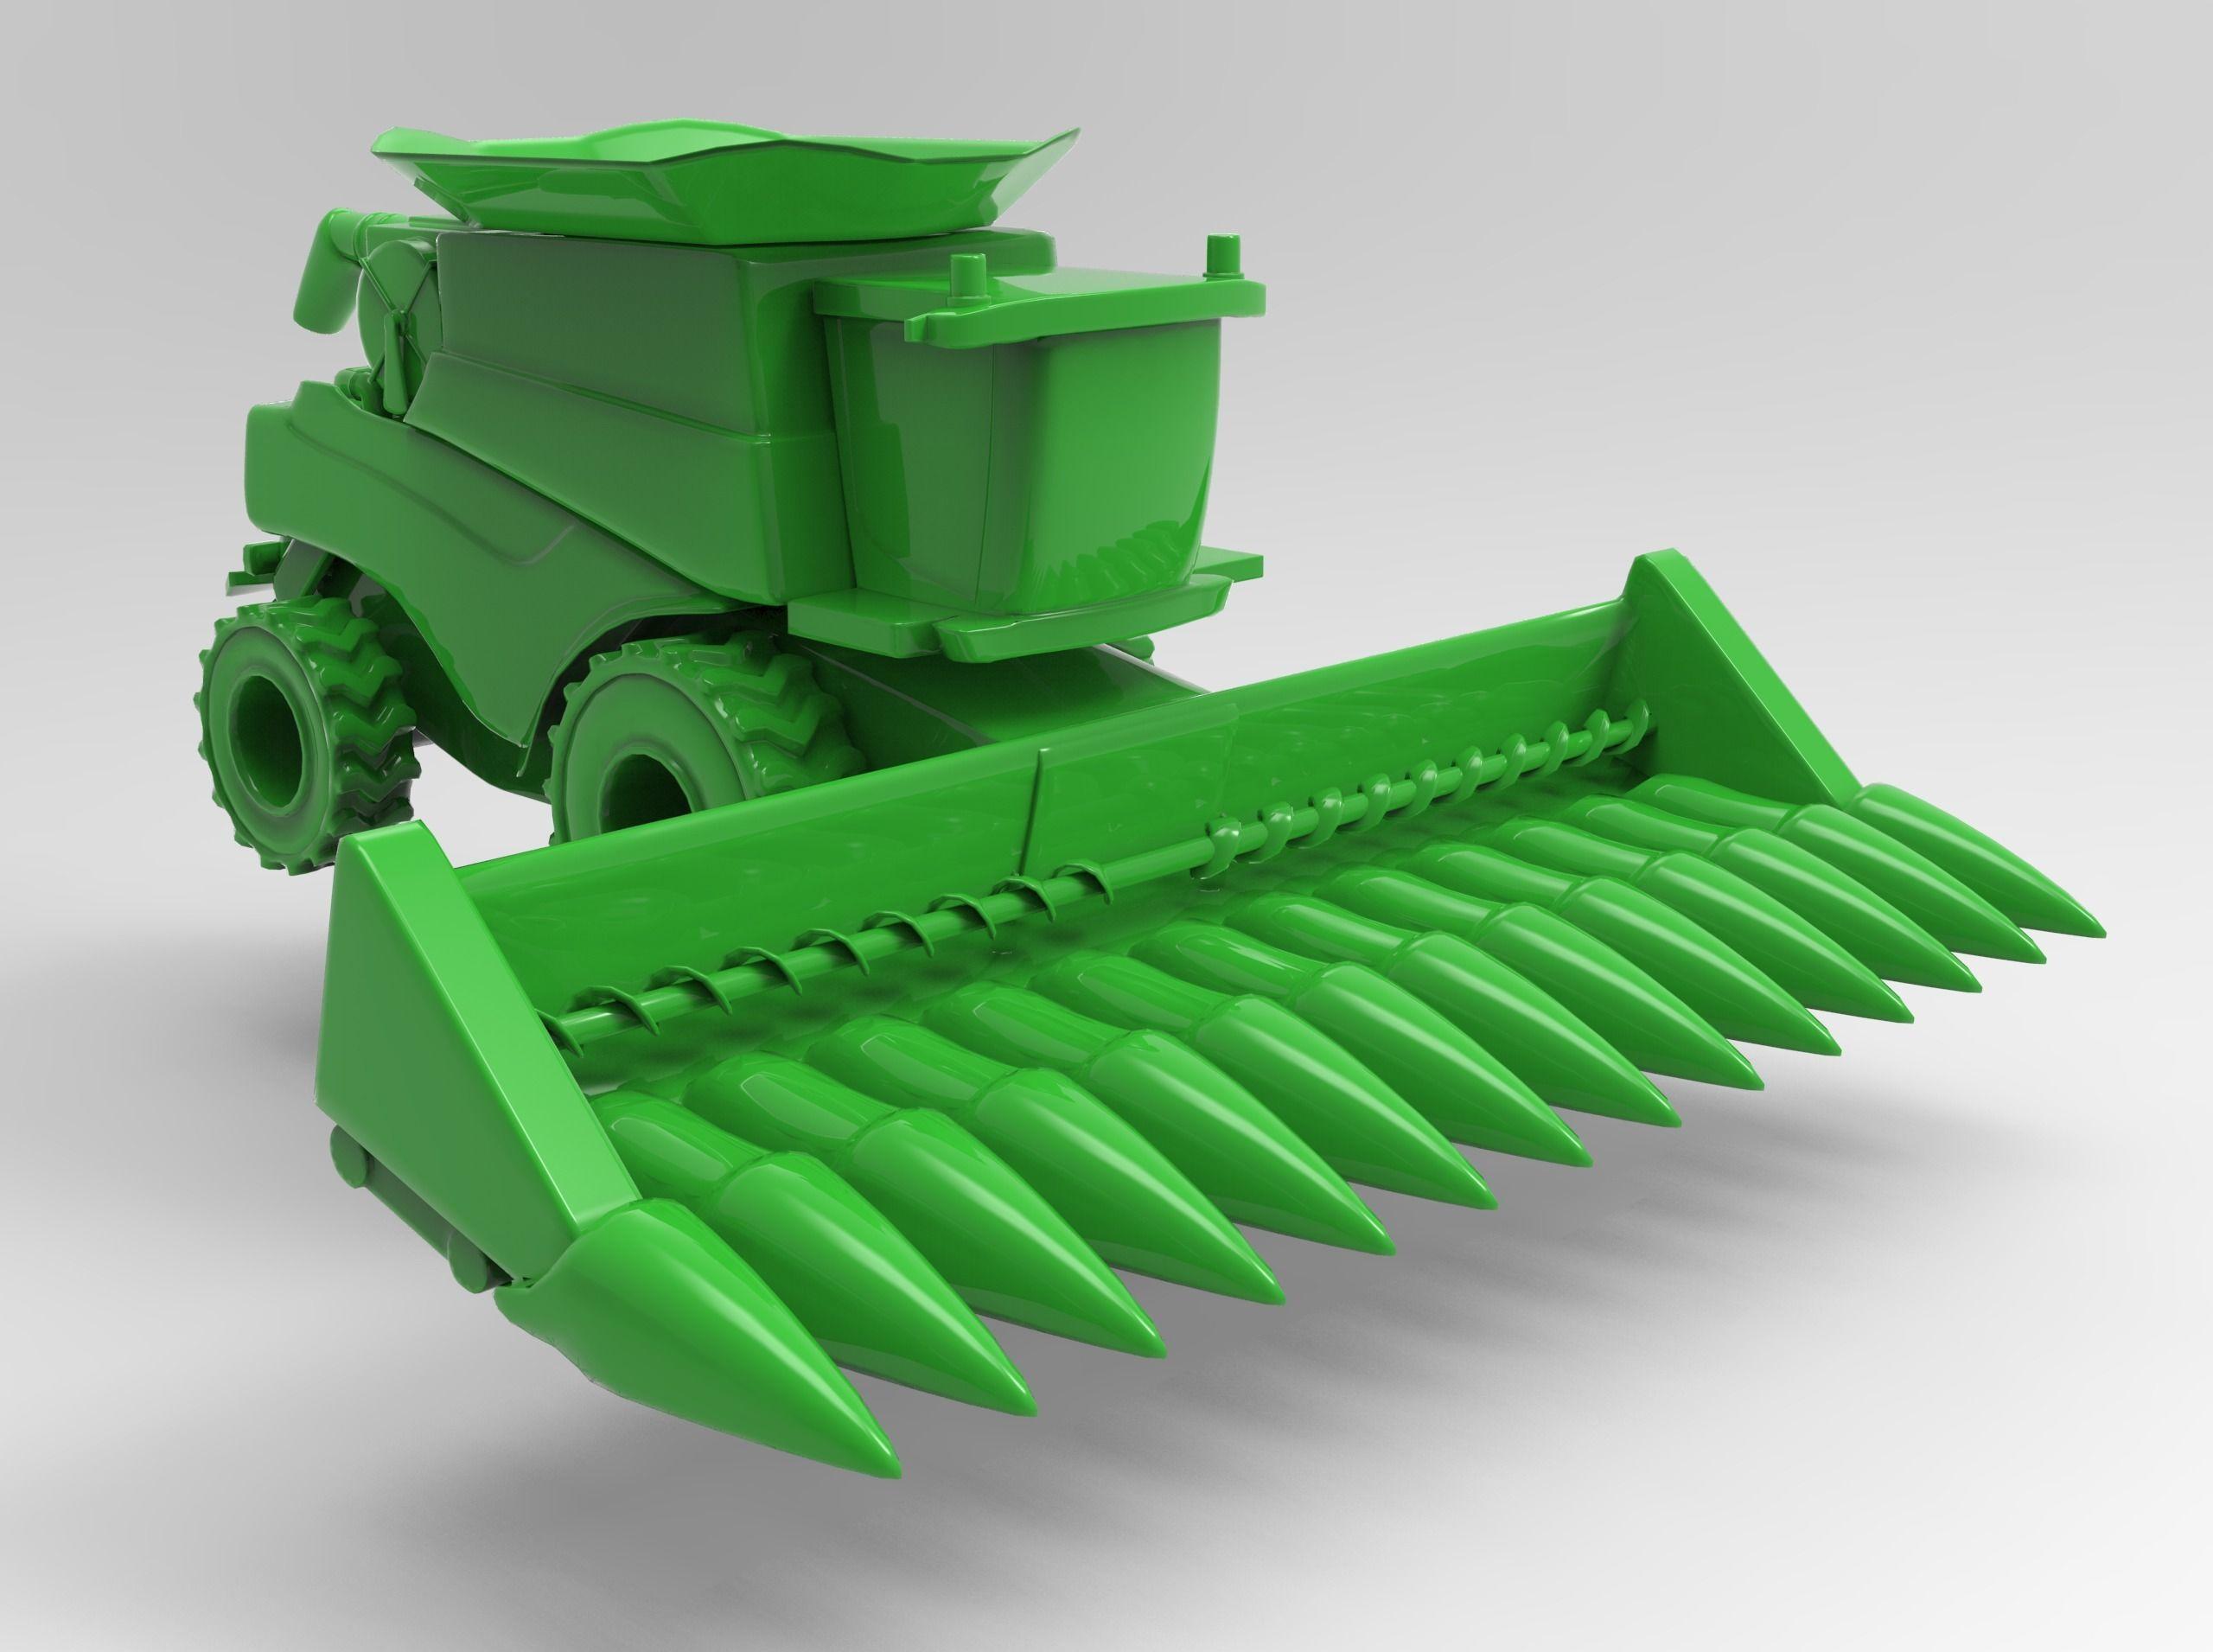 Combine Harvester with Corn Head | 3D model